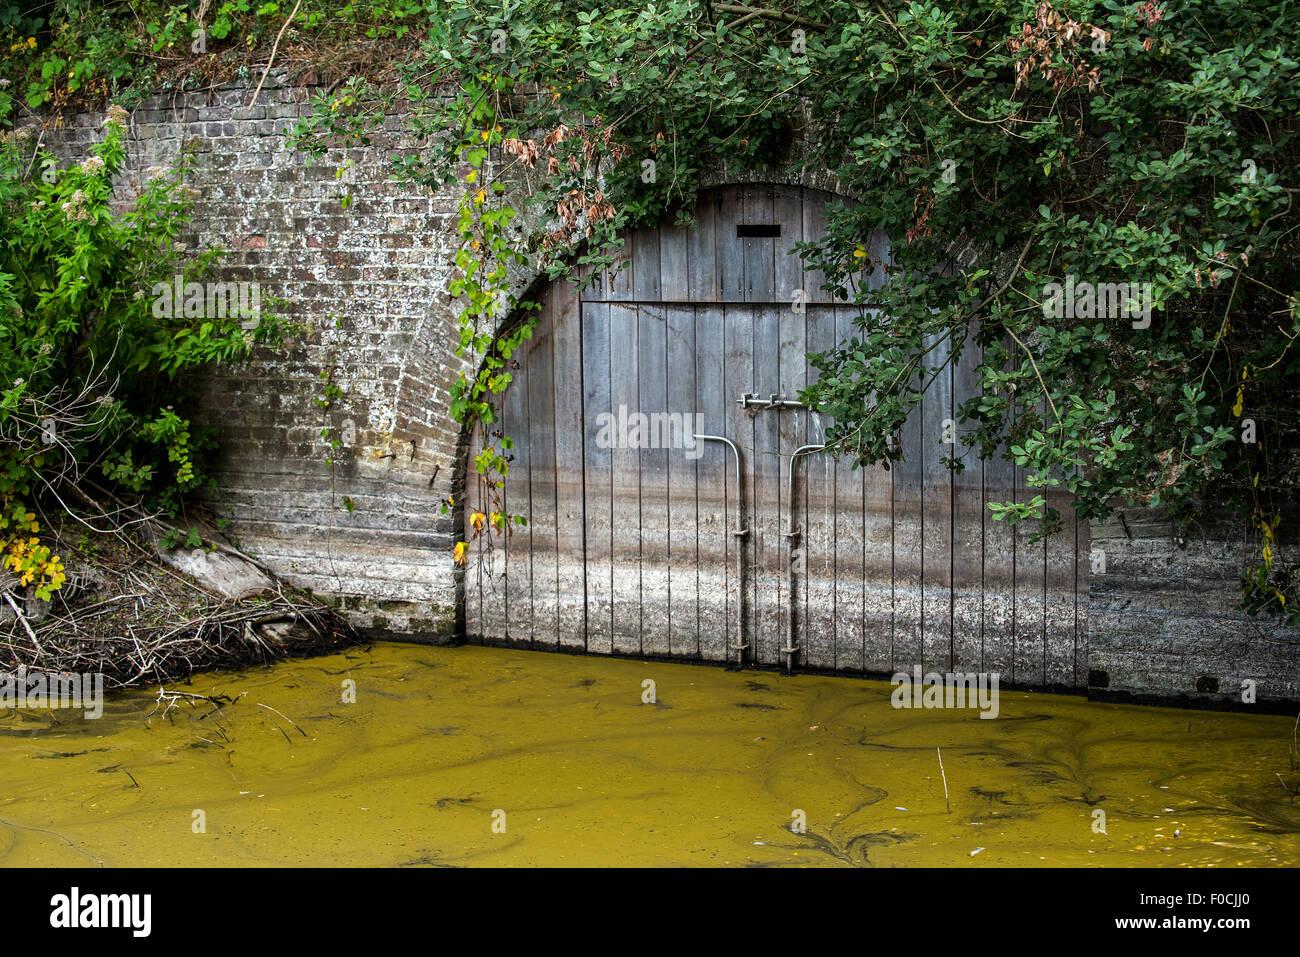 Locked wooden door of brick vault over stream, hibernation place for bats in nature reserve - Stock Image